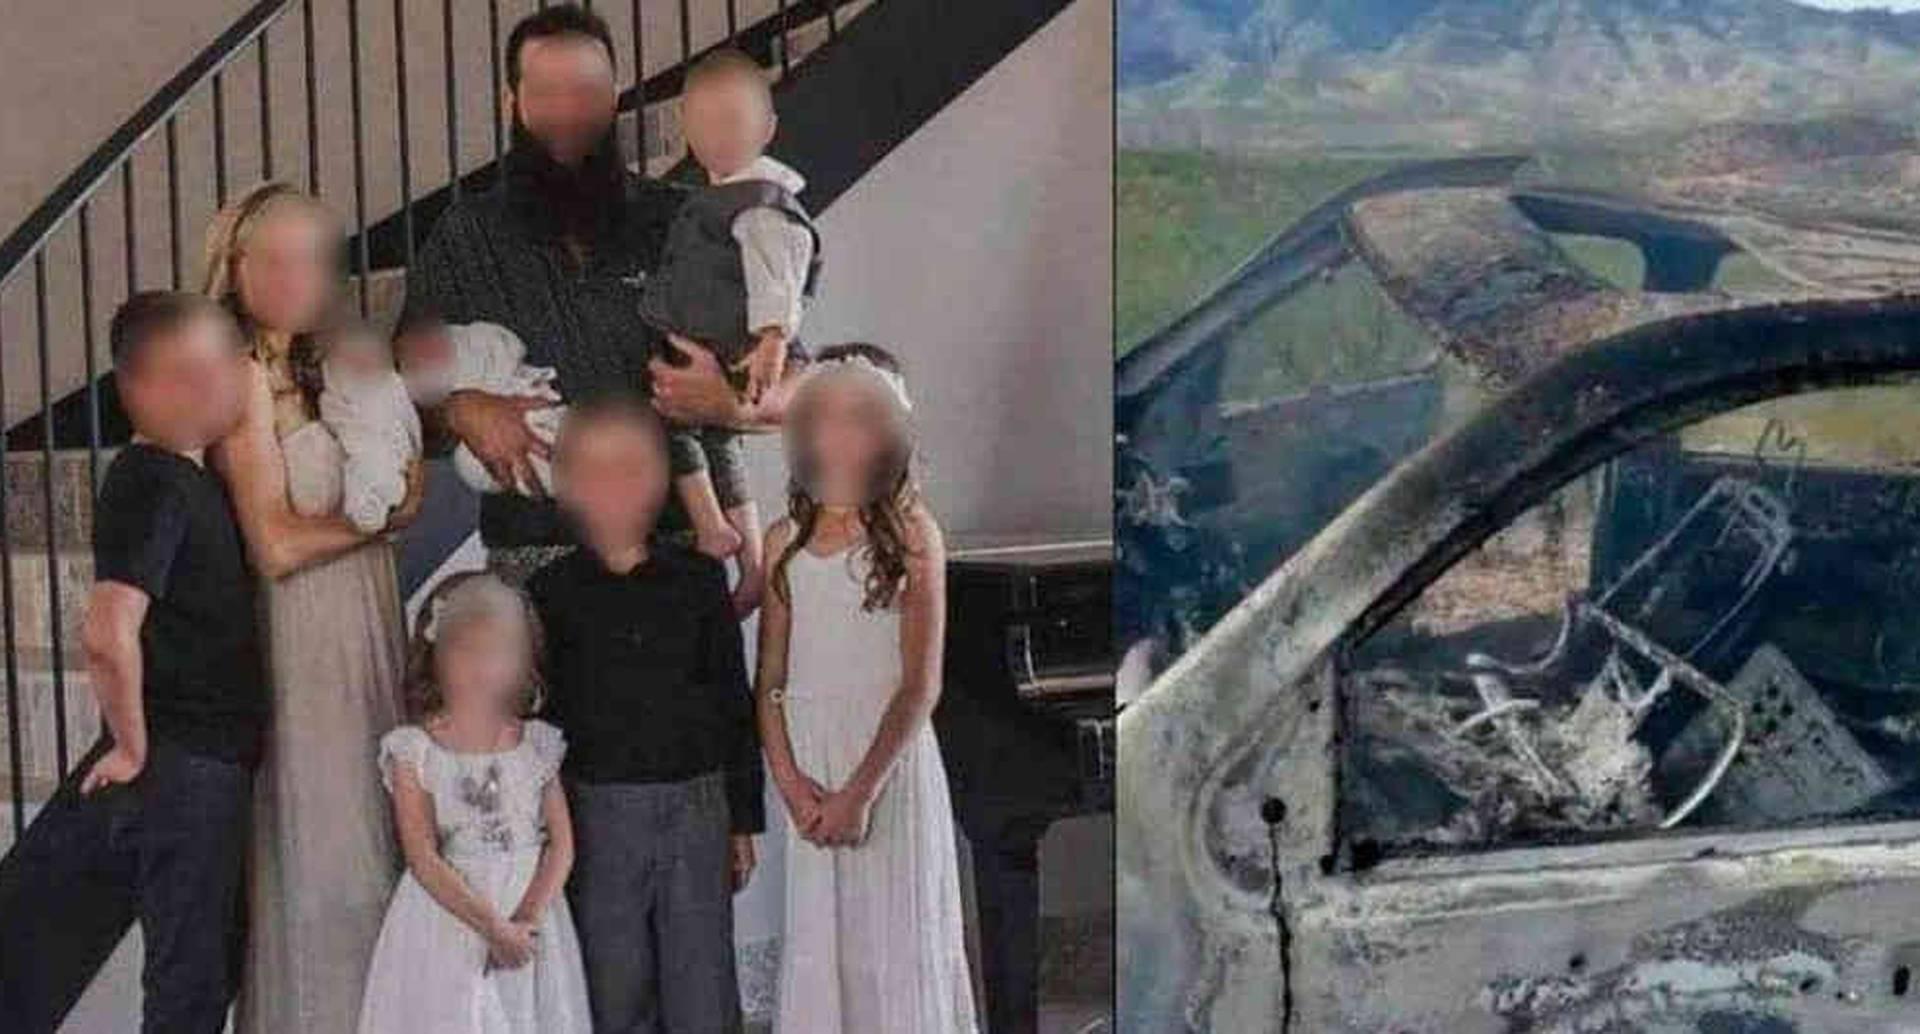 Matan a nueve miembros de la comunidad mormona estadounidense en México.